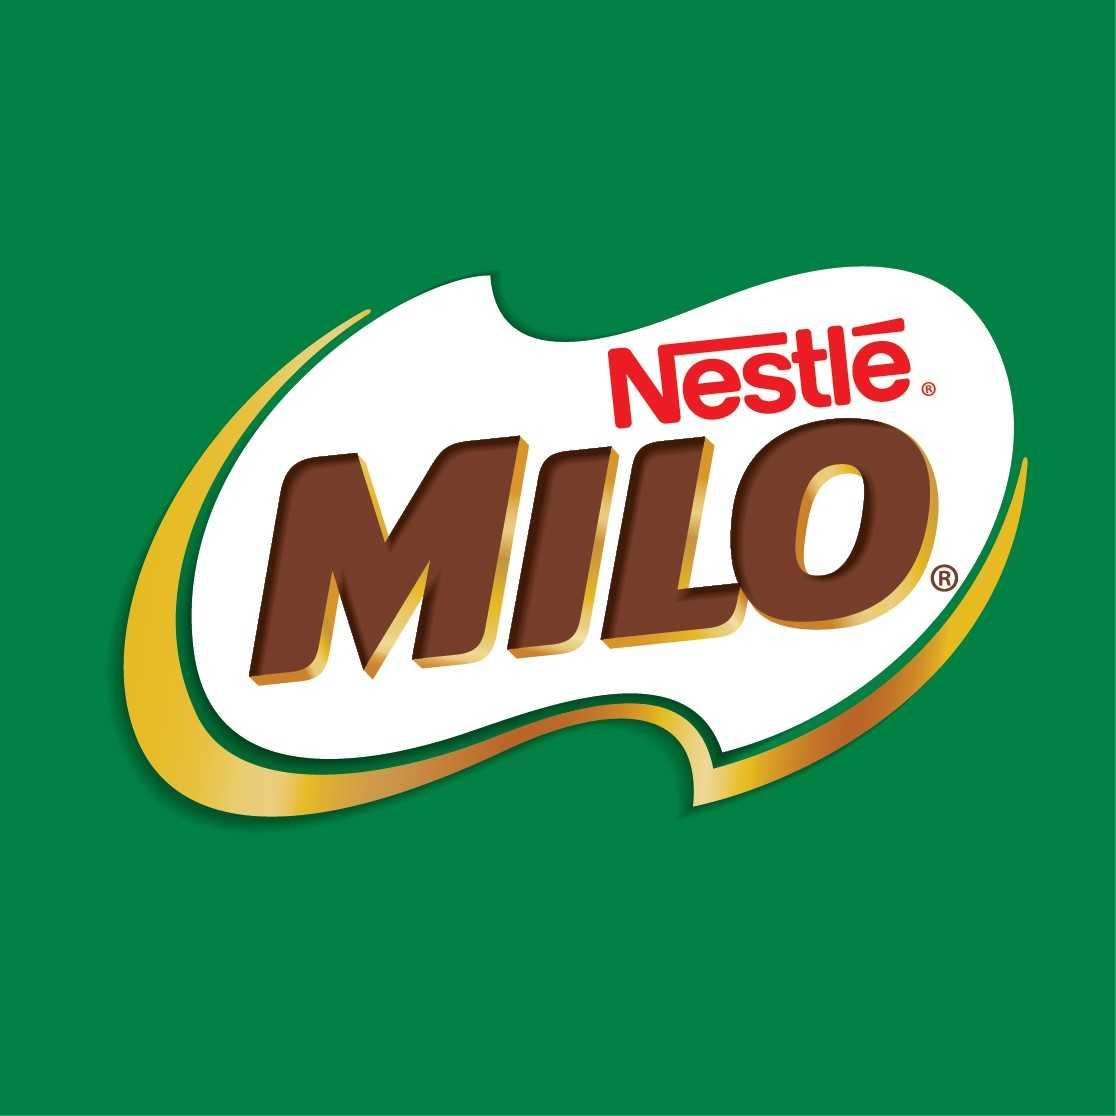 Jual Milo 3in1 Activ Go Minuman Coklat 800 G Kemasan Pouch Kaleng 12273893